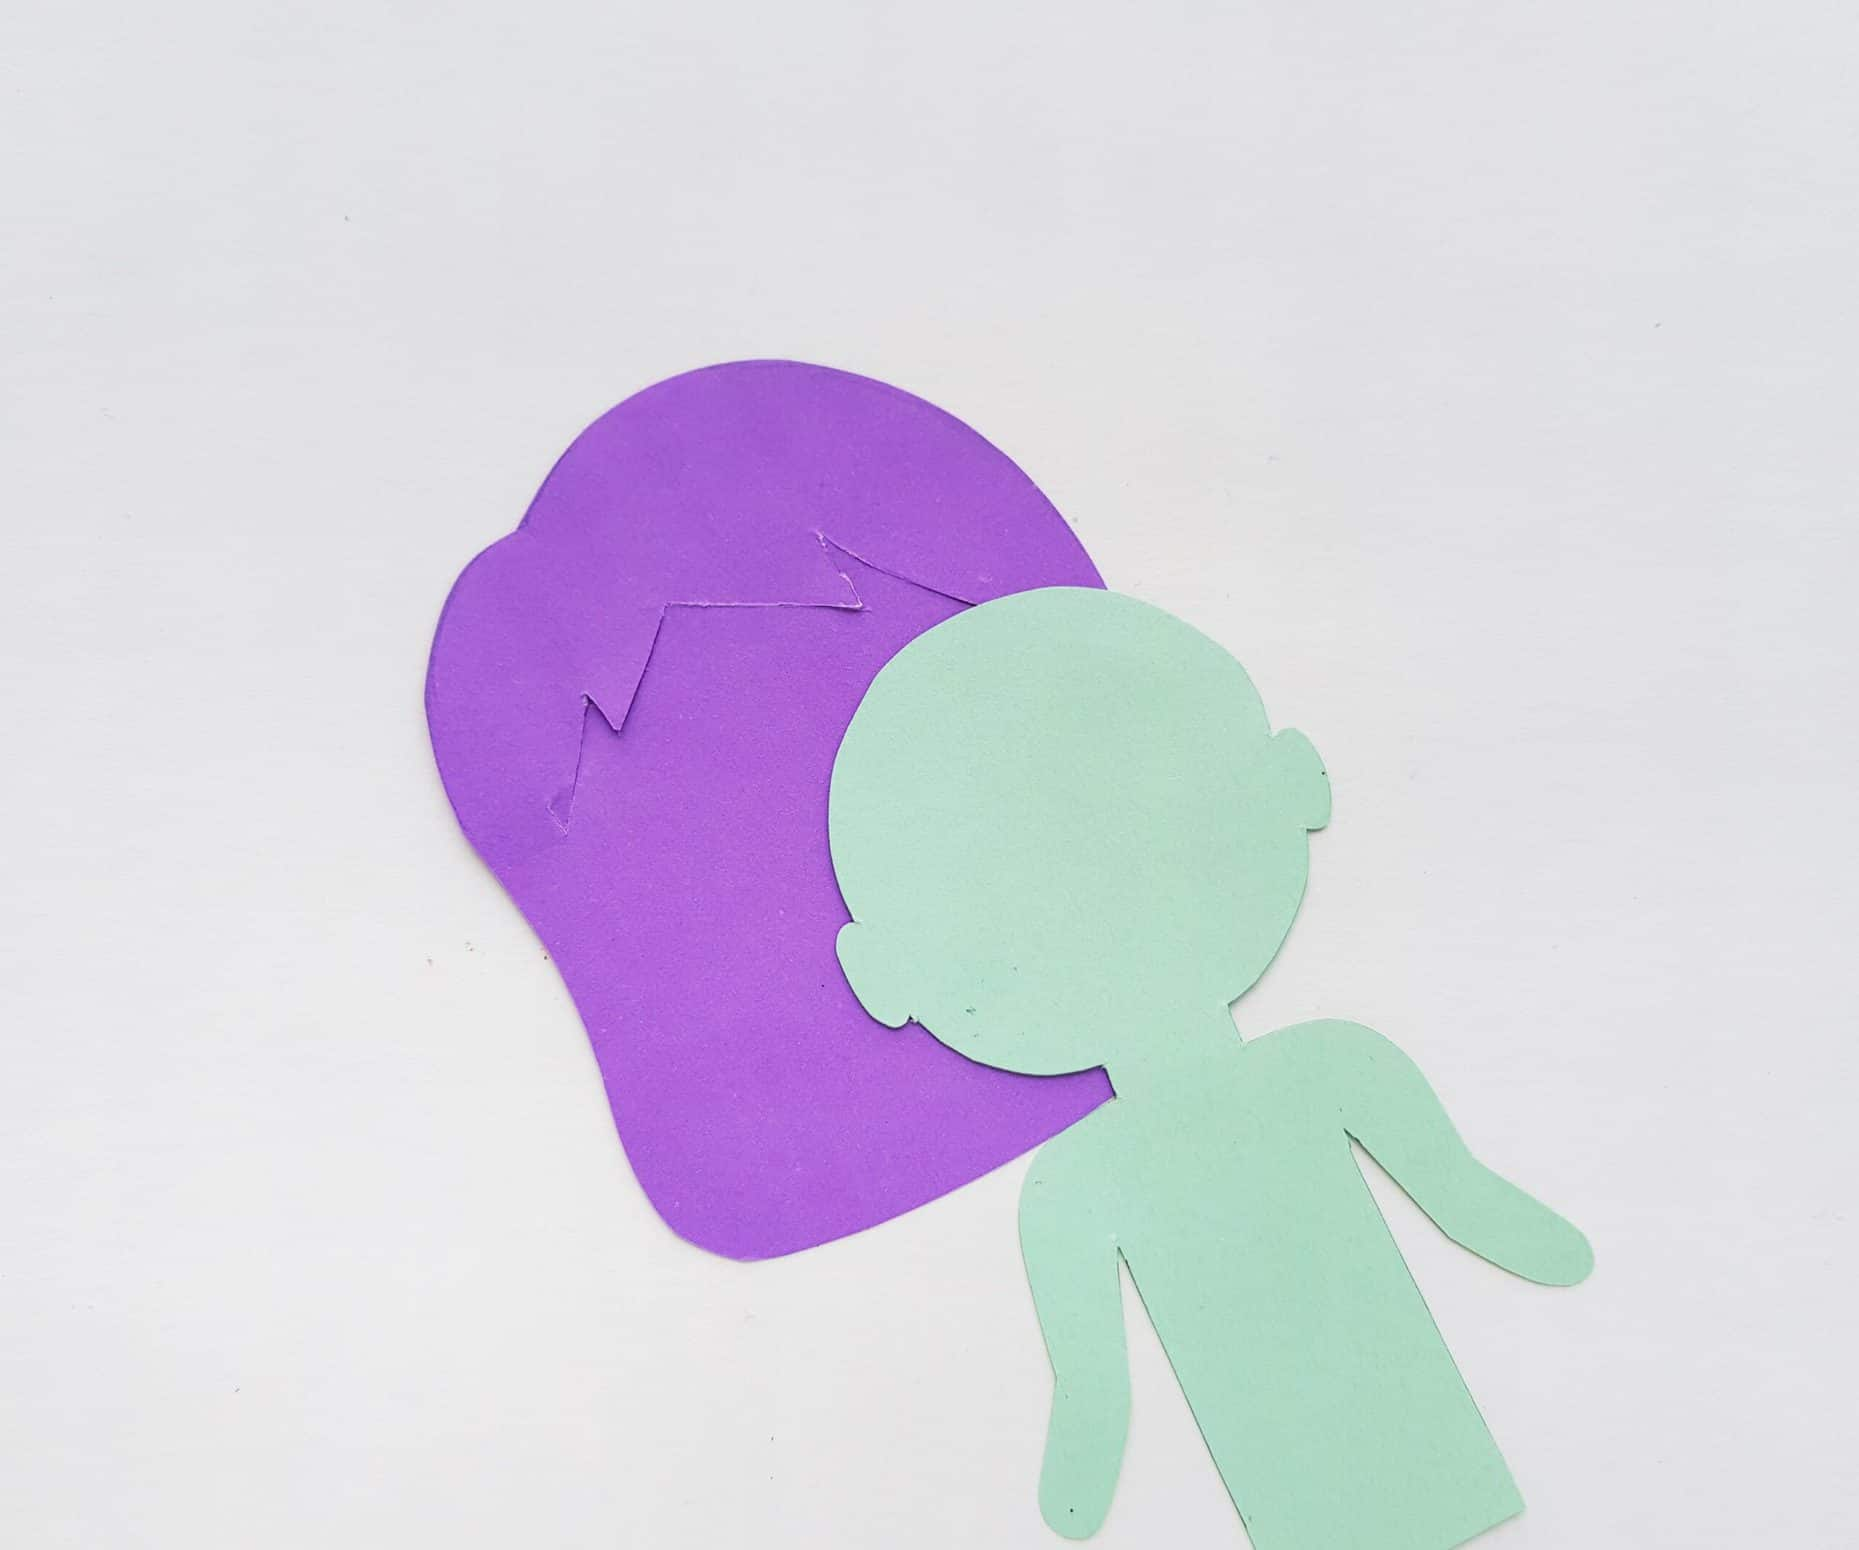 paper doll cutout